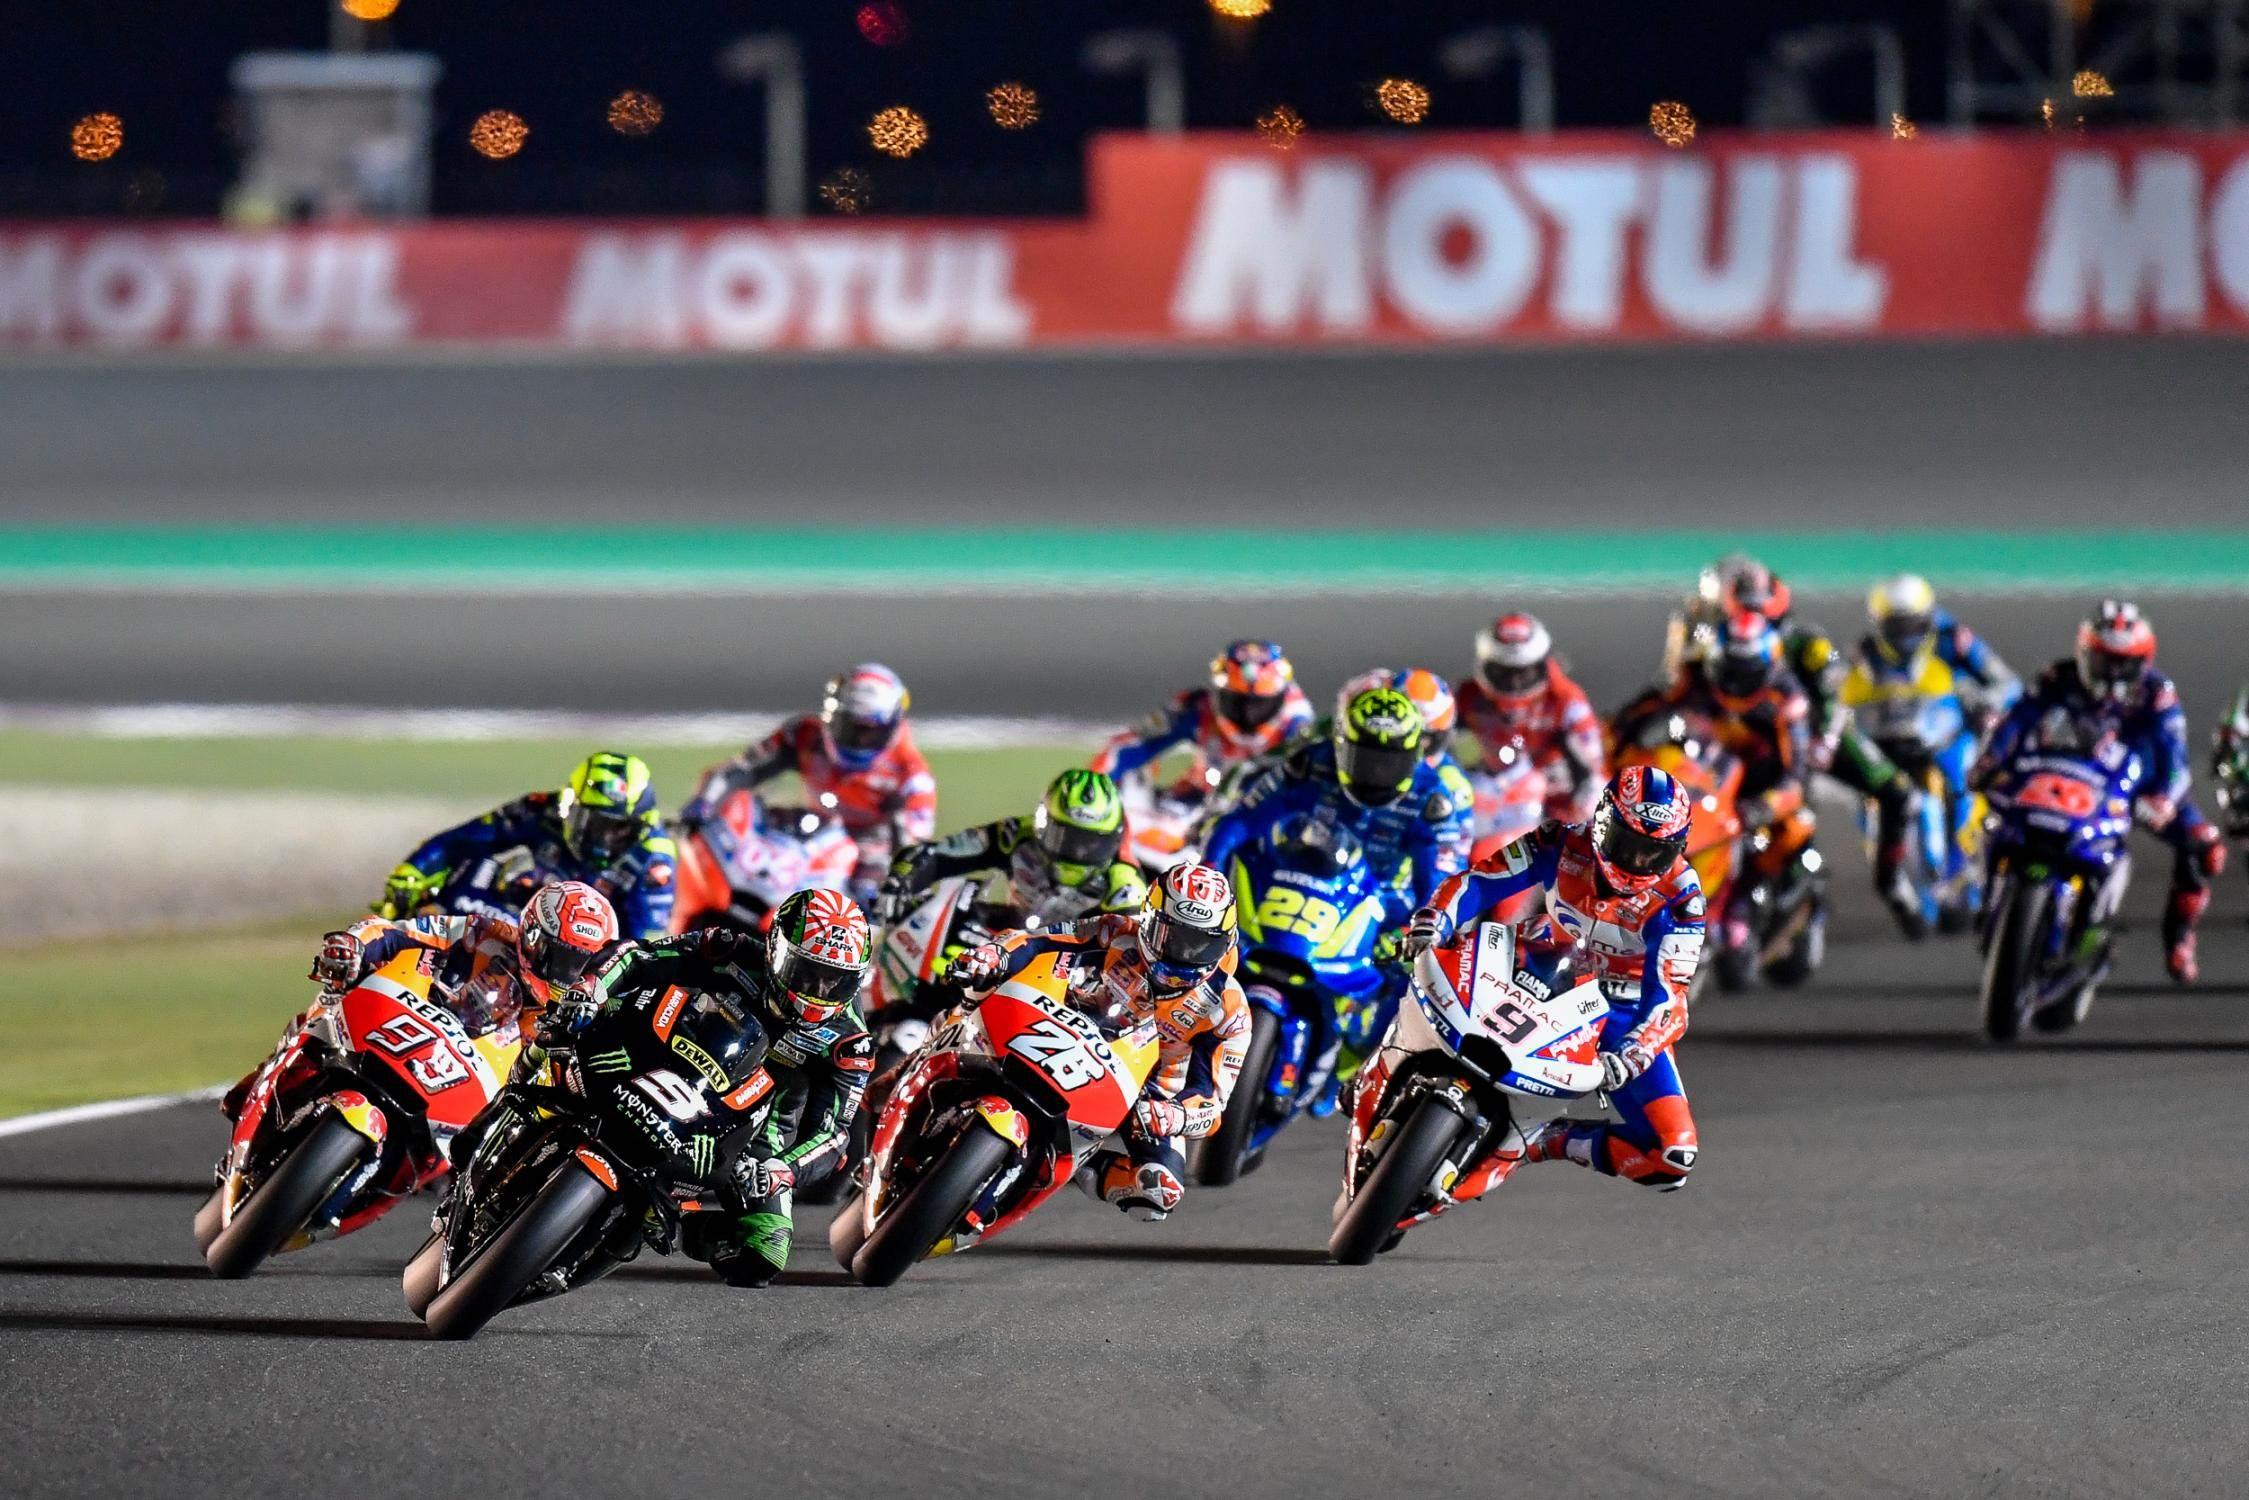 2018 Qatar MotoGP race report